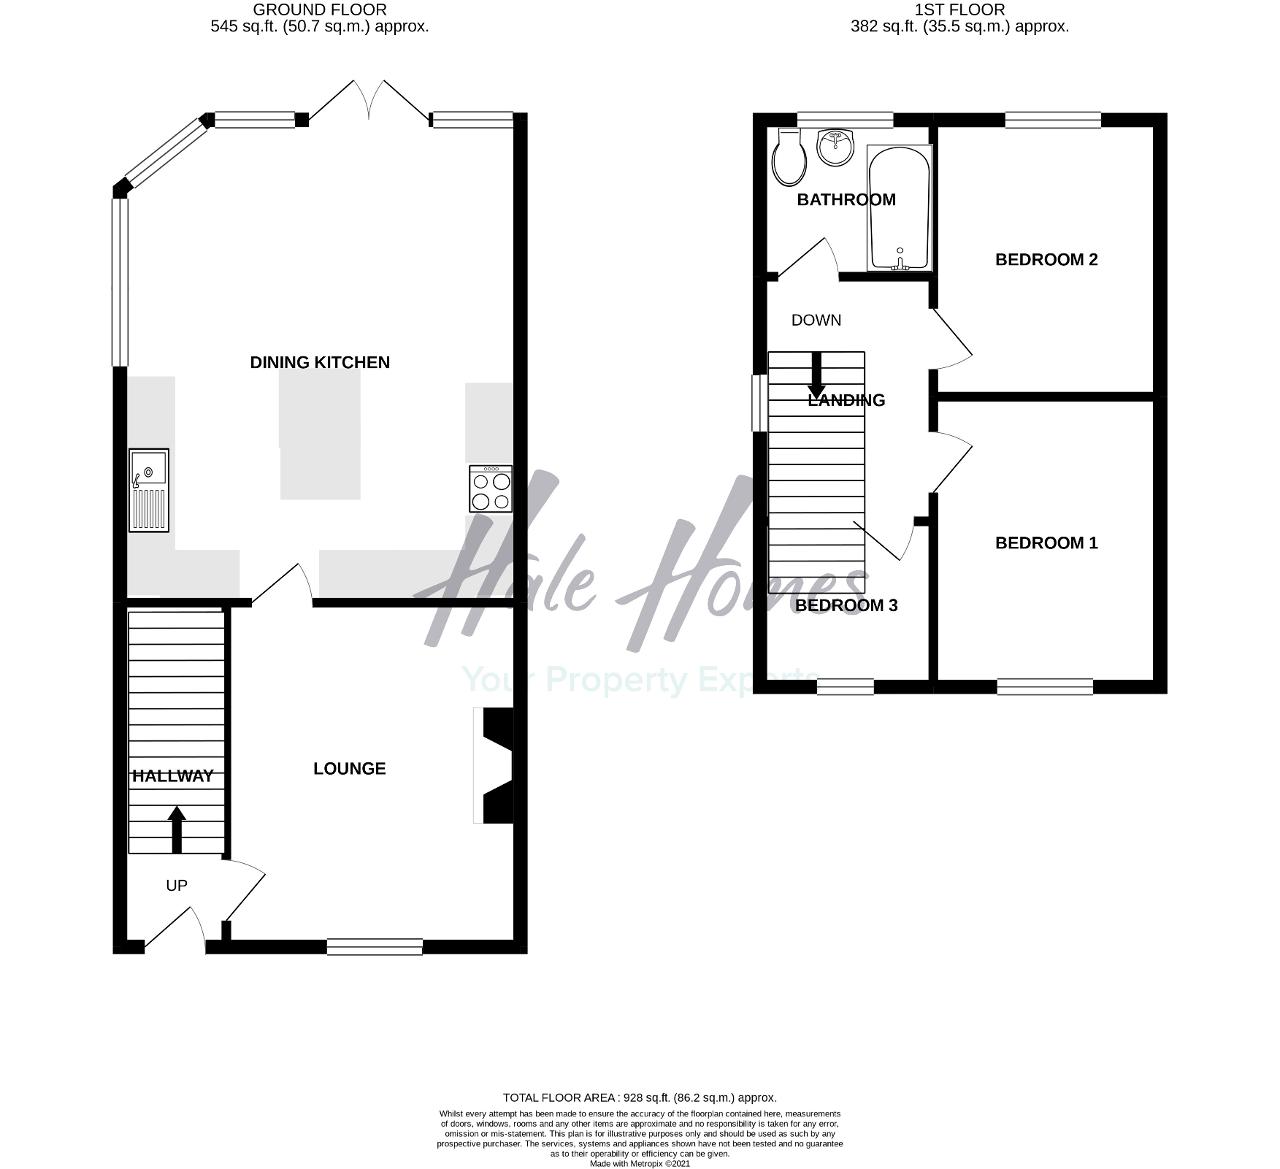 Floorplan of Bowness Road, Timperley, Altrincham, WA15 7YB